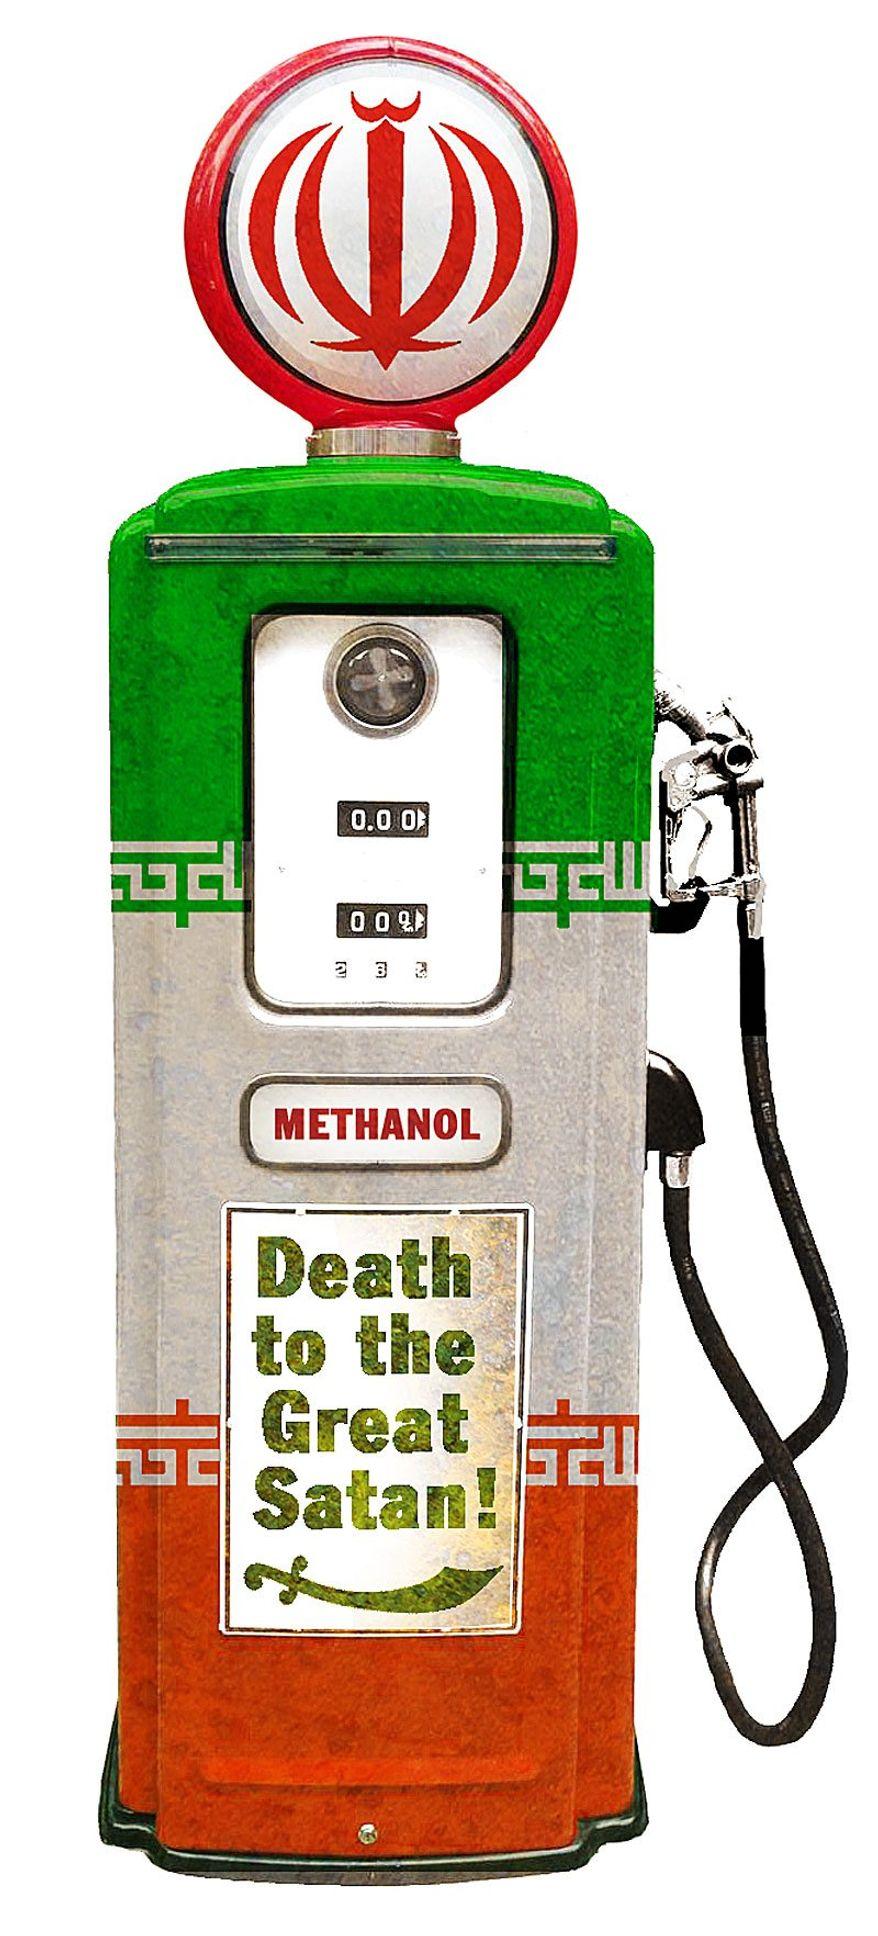 Illustration on Iran's development of methanol in response to U.S. sanctions by Alexander Hunter/The Washington Times